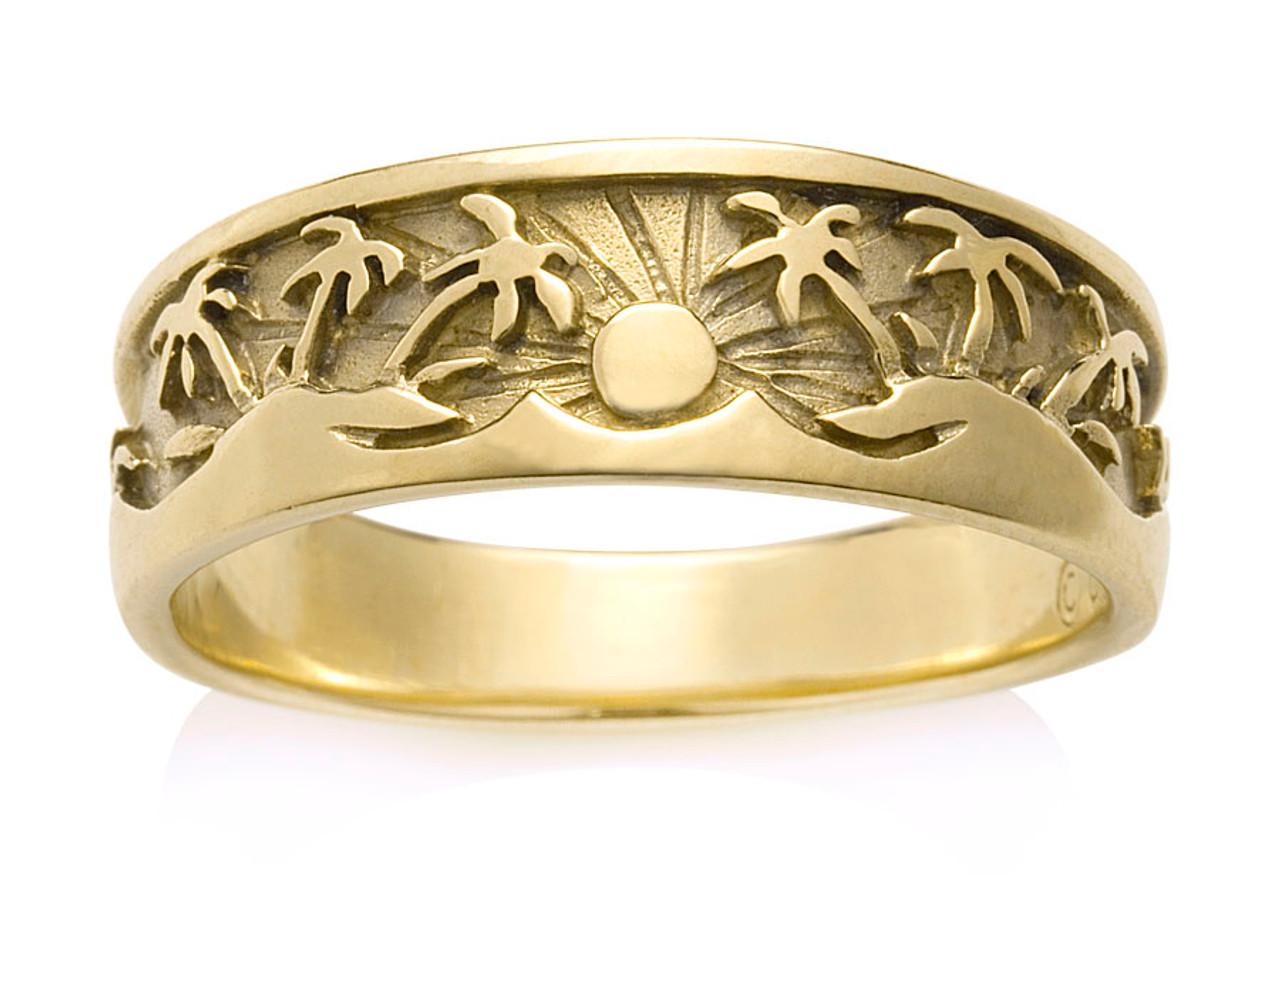 138G - Men's Tropical Palm Tree Ring